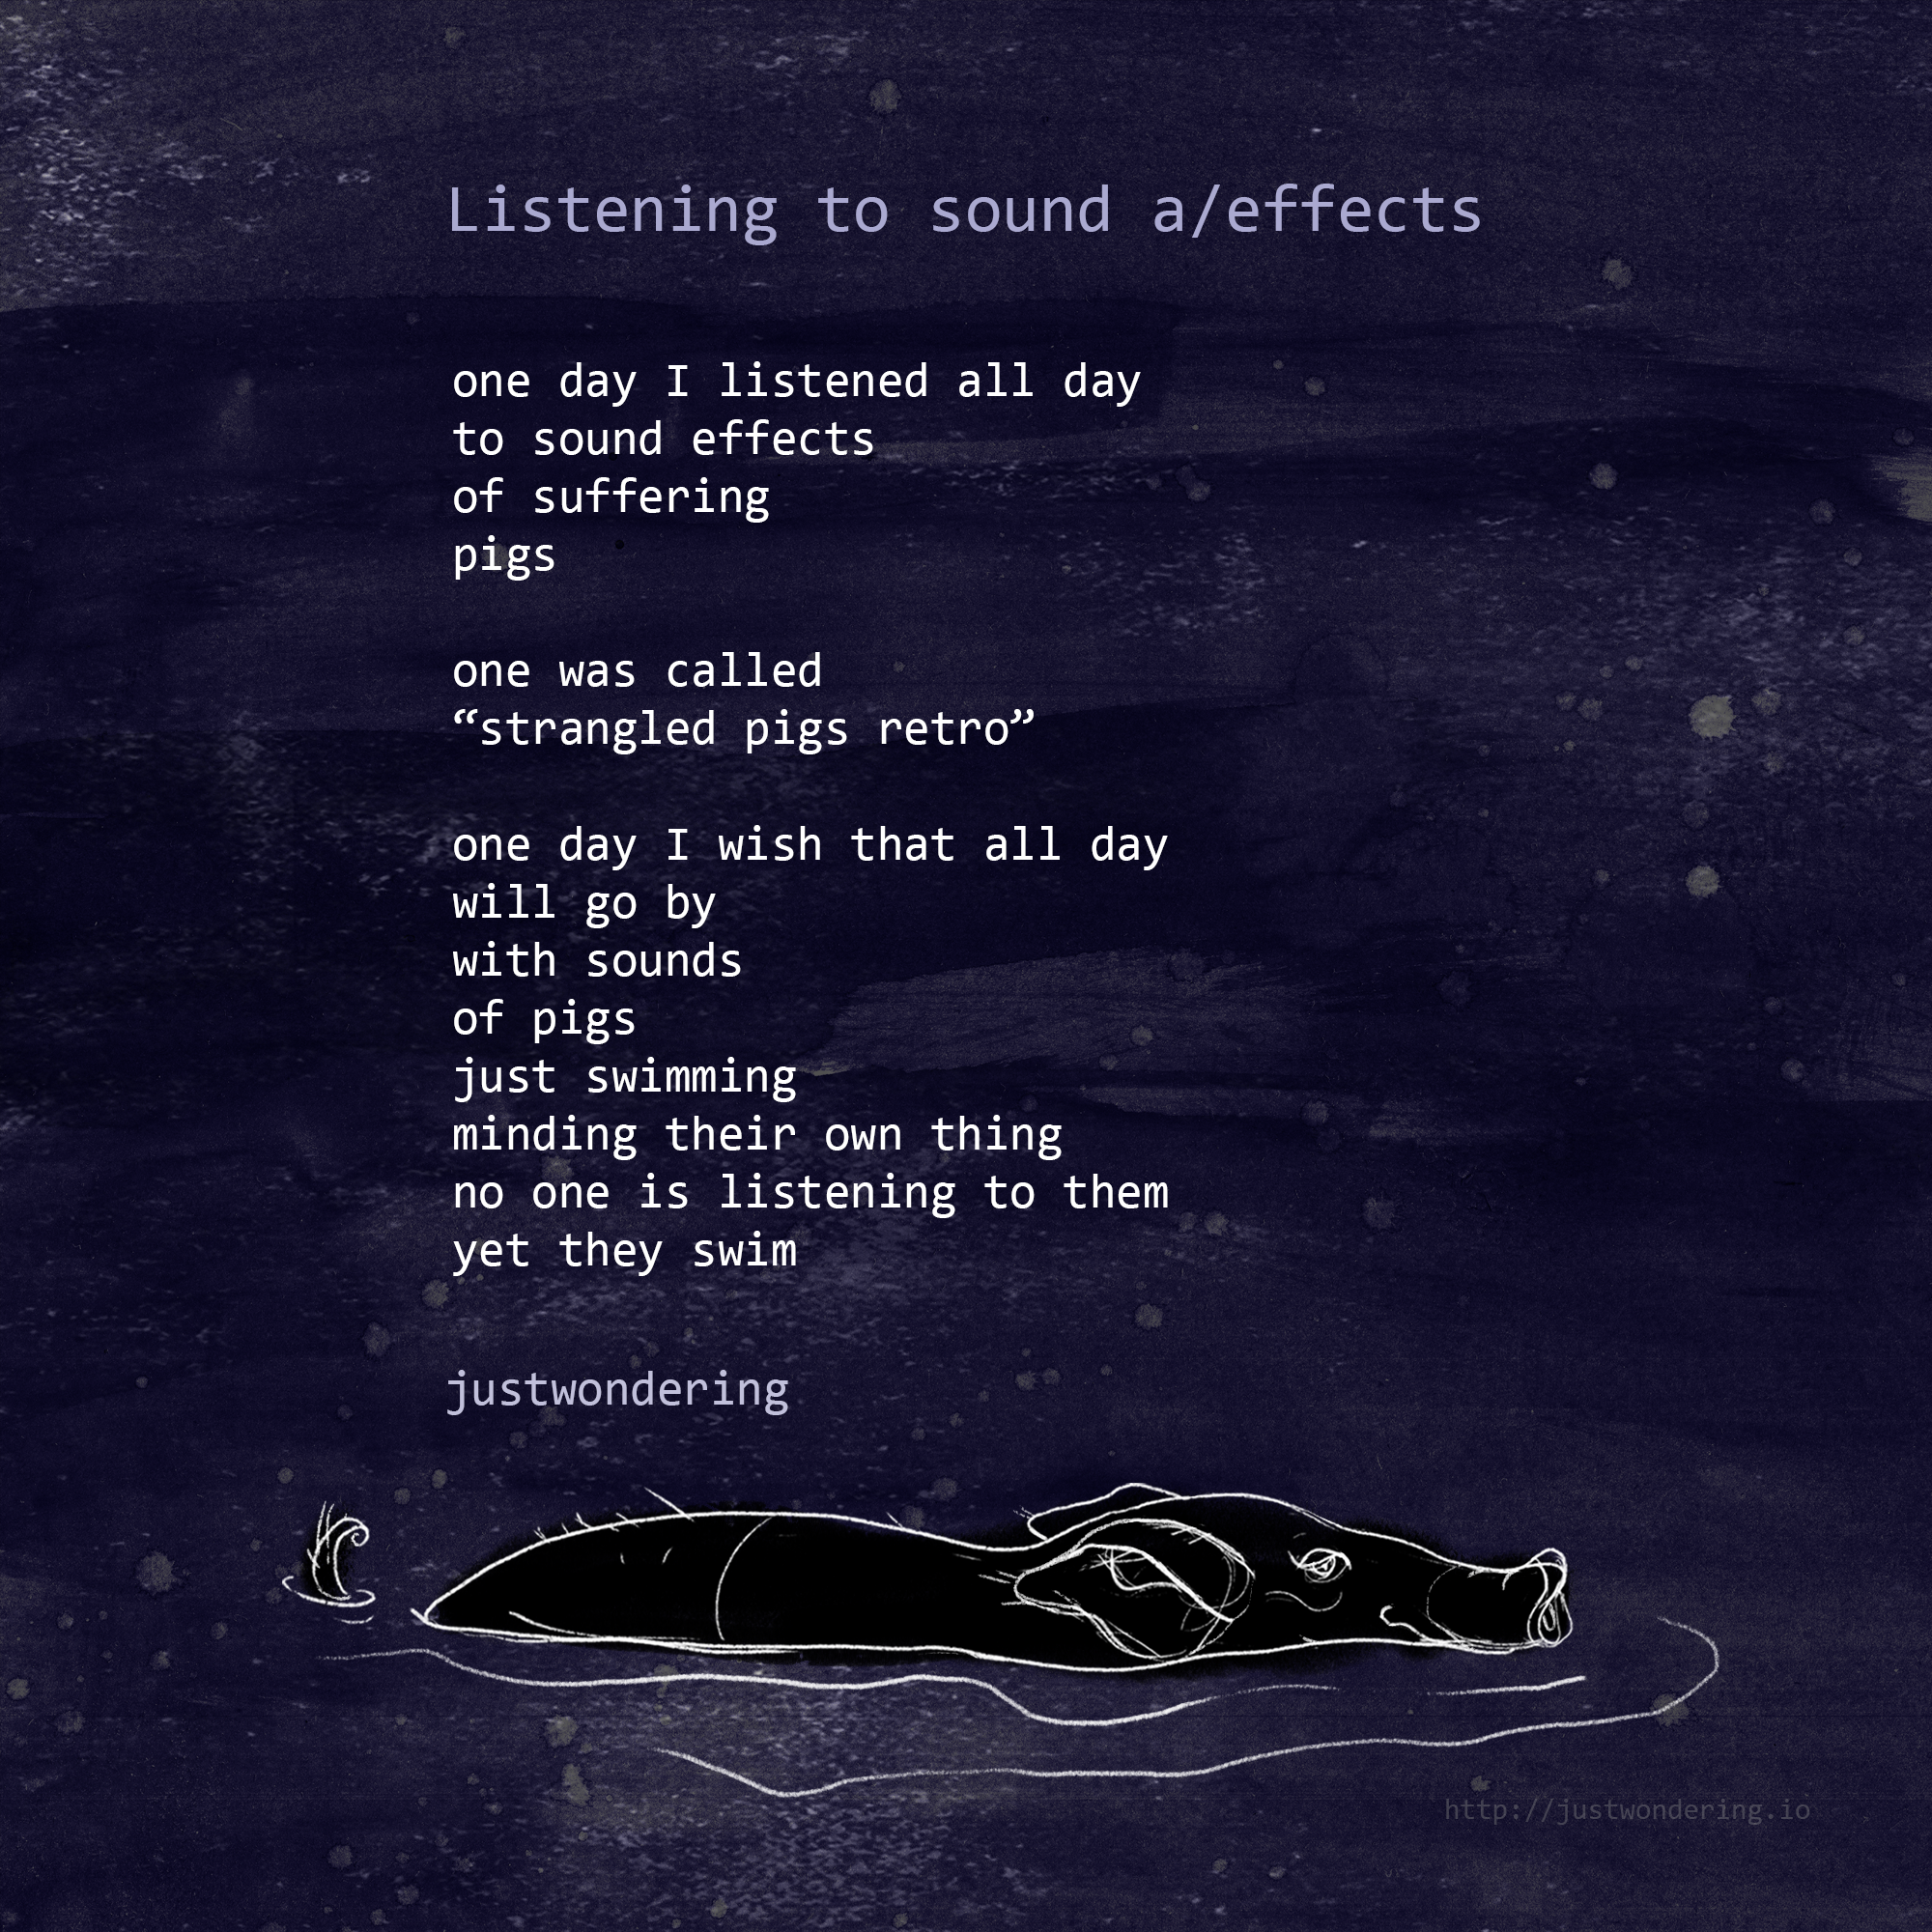 Poem-Listening to sound aeffects